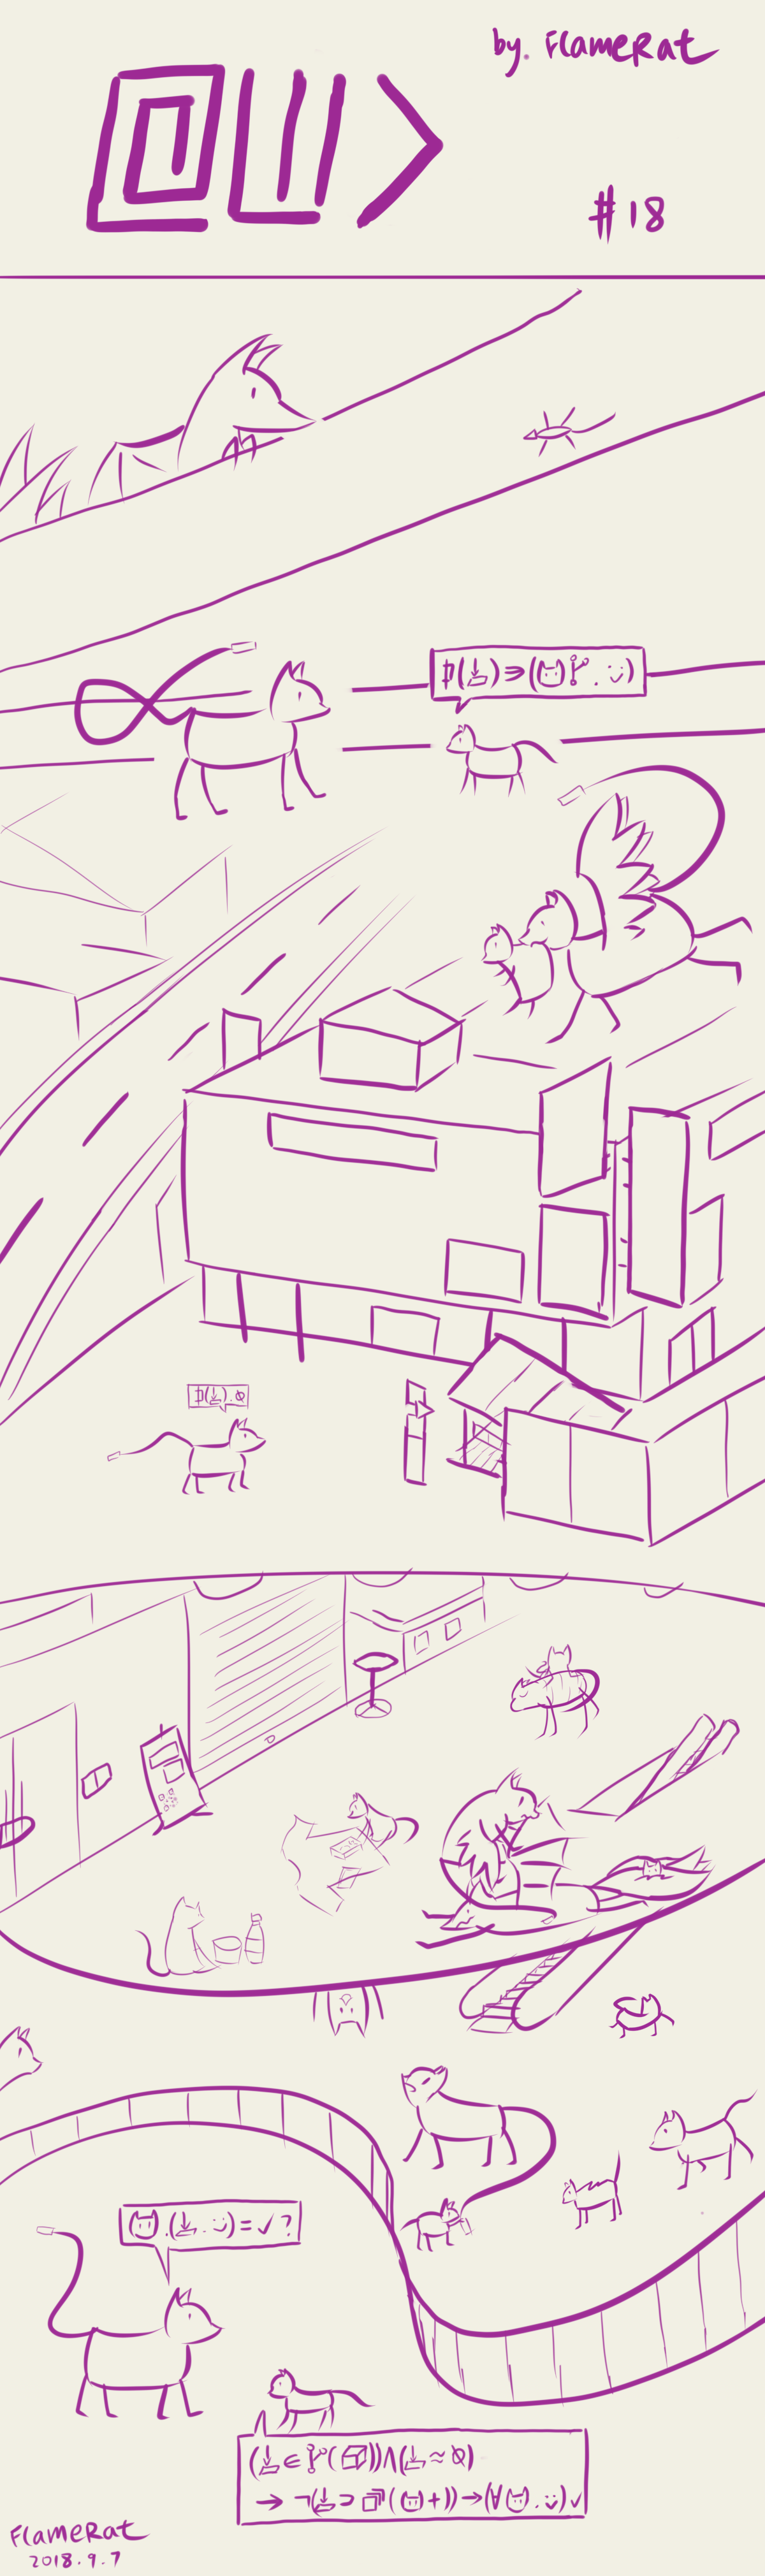 [Comic] At Wild Do #18 by FlameRat-YehLon